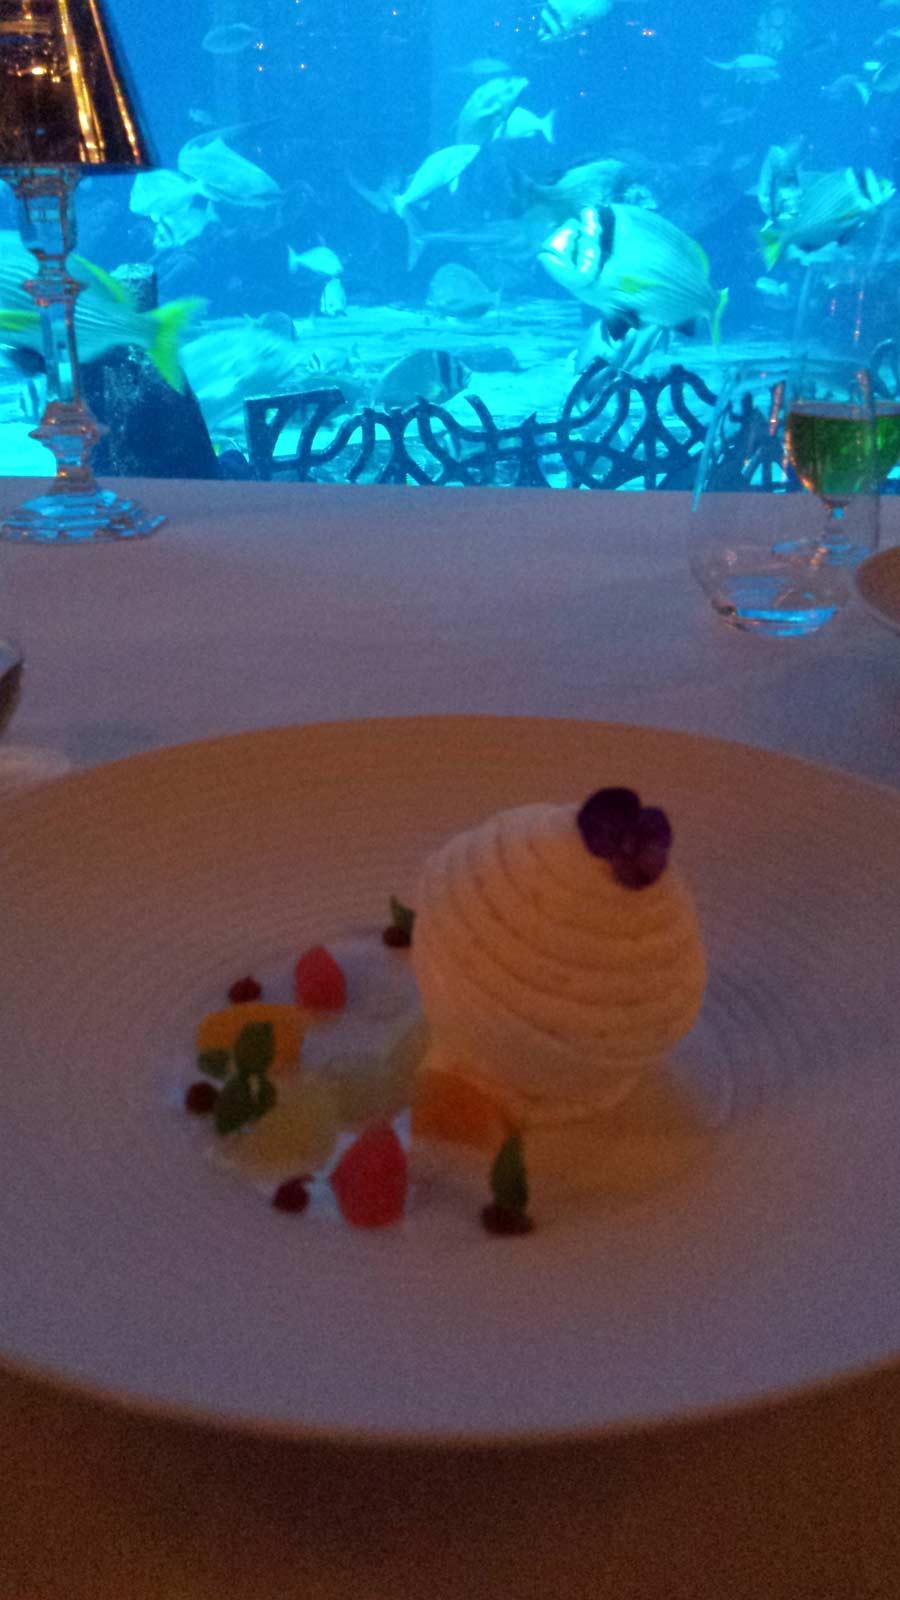 Vacherin-agrumes,-meringue-,-oragne-blossom